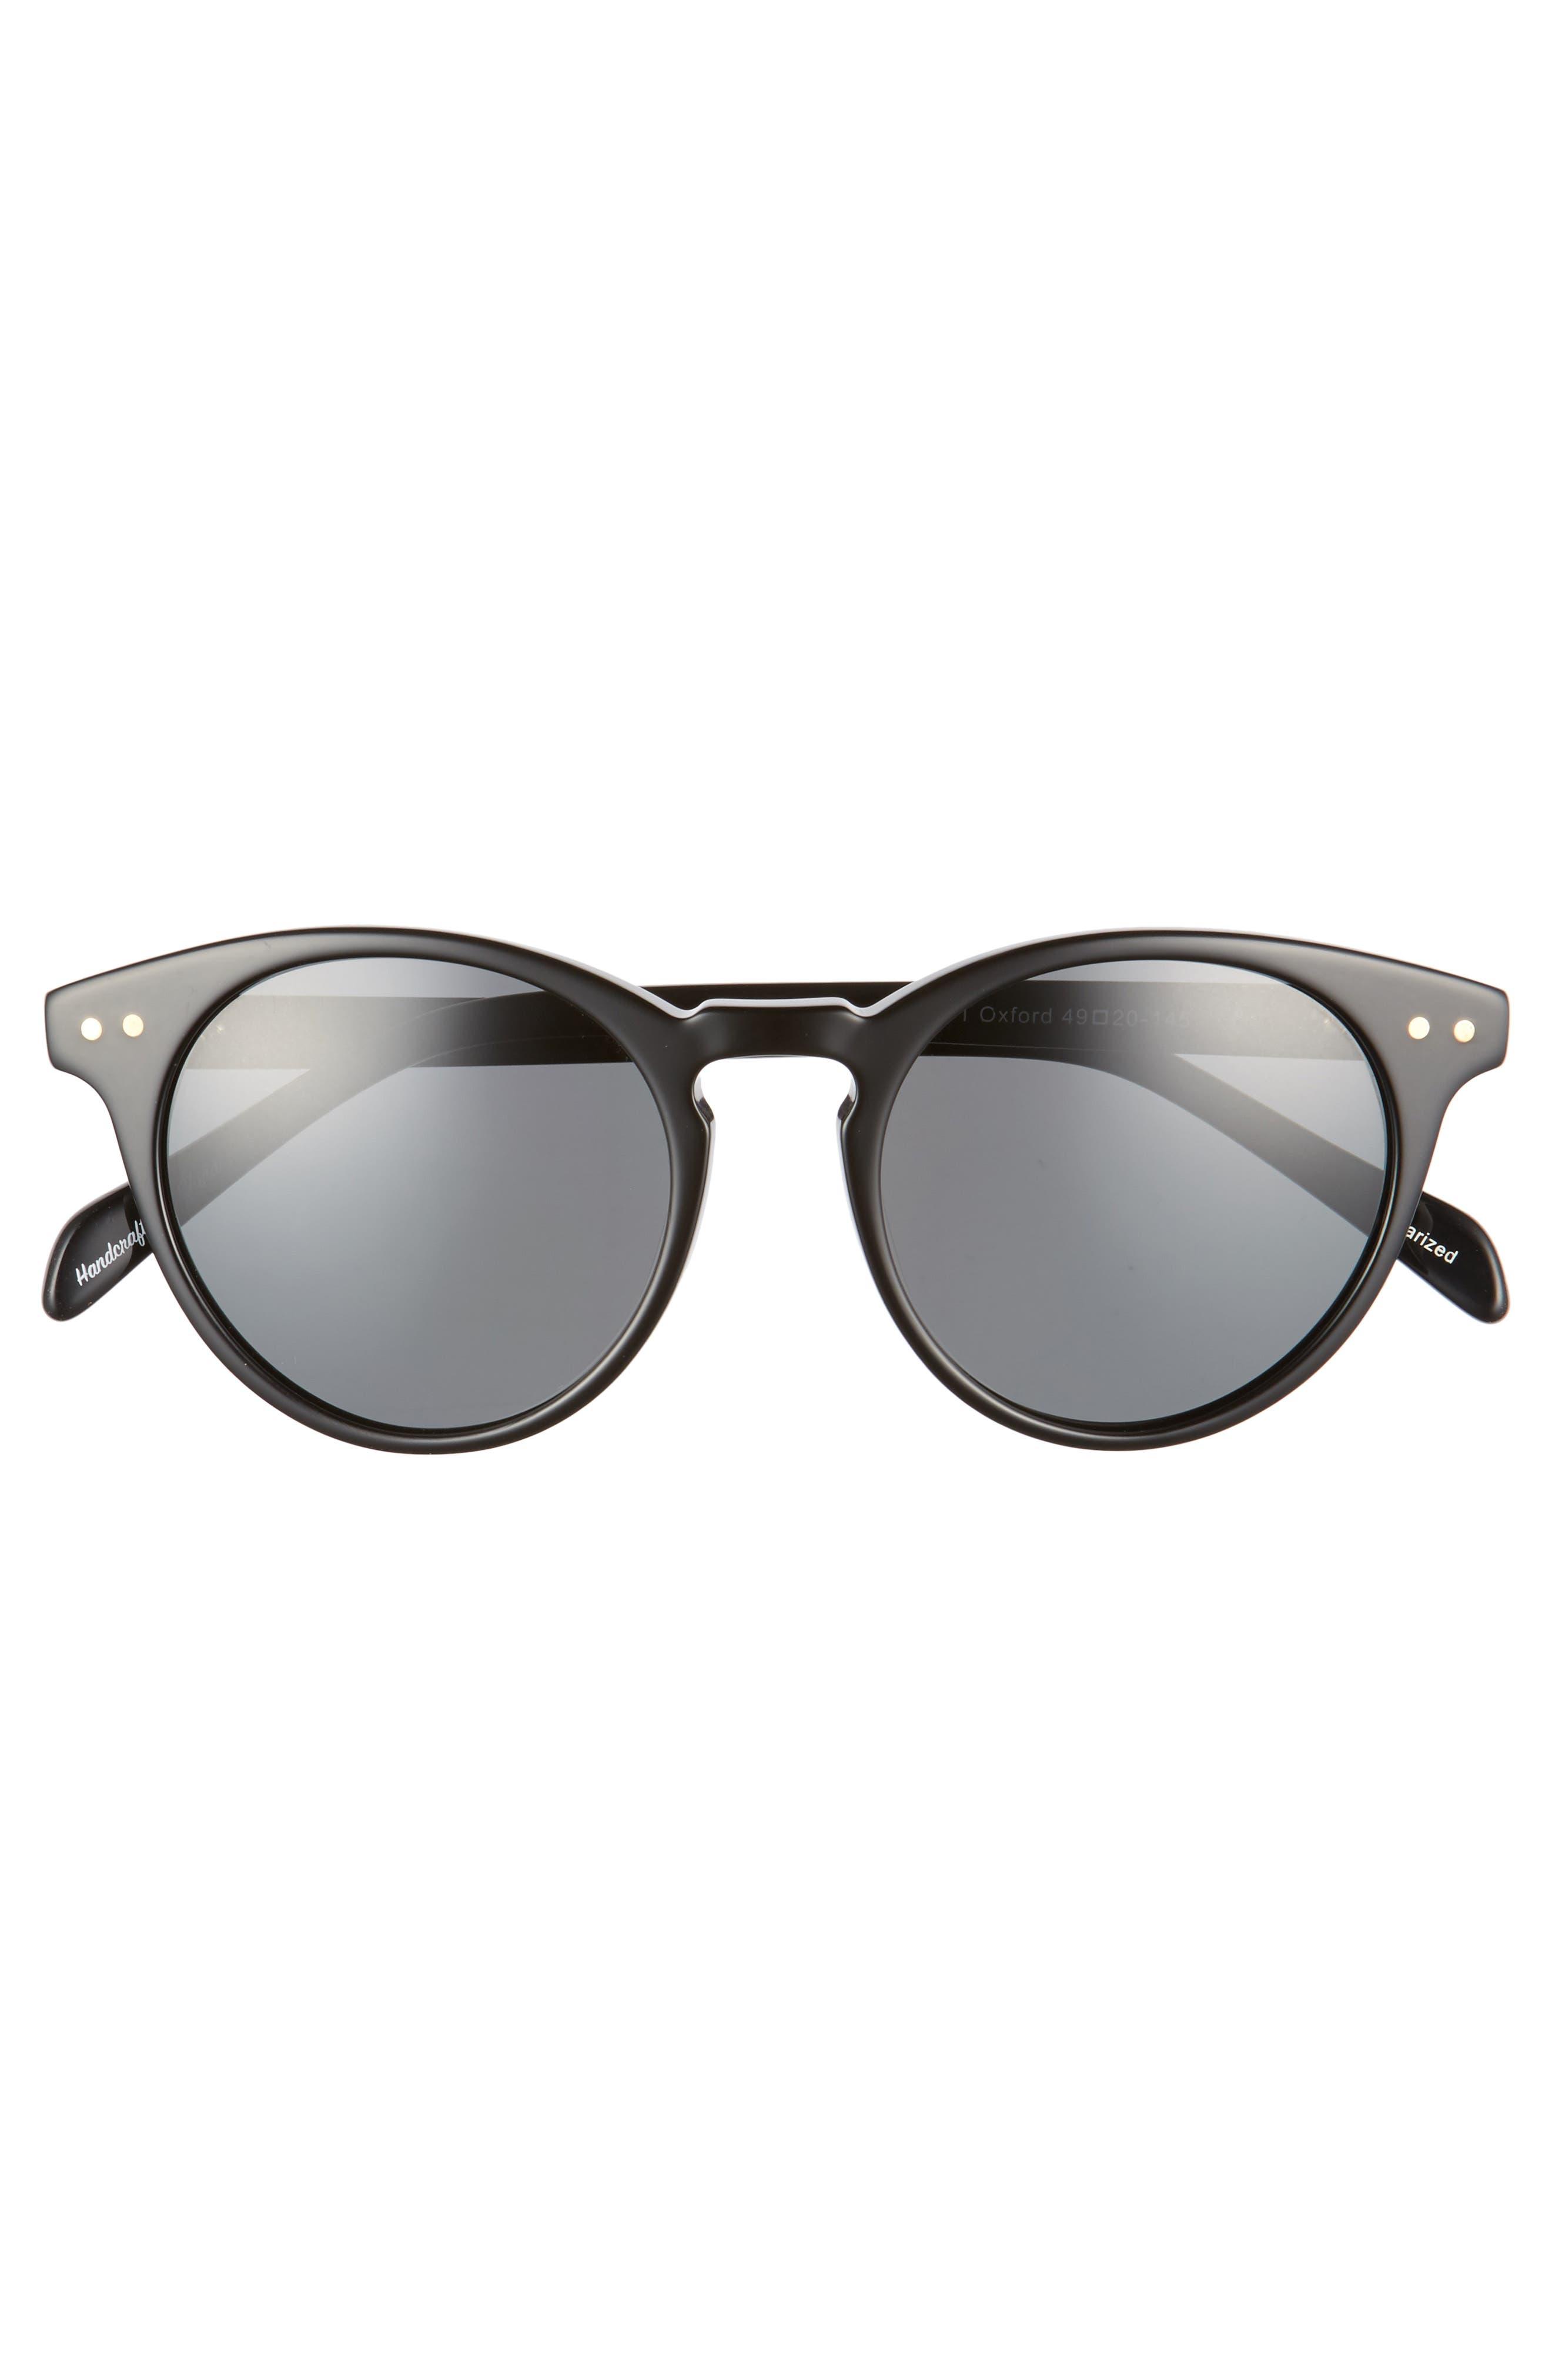 Oxford 49mm Polarized Sunglasses,                             Alternate thumbnail 3, color,                             001